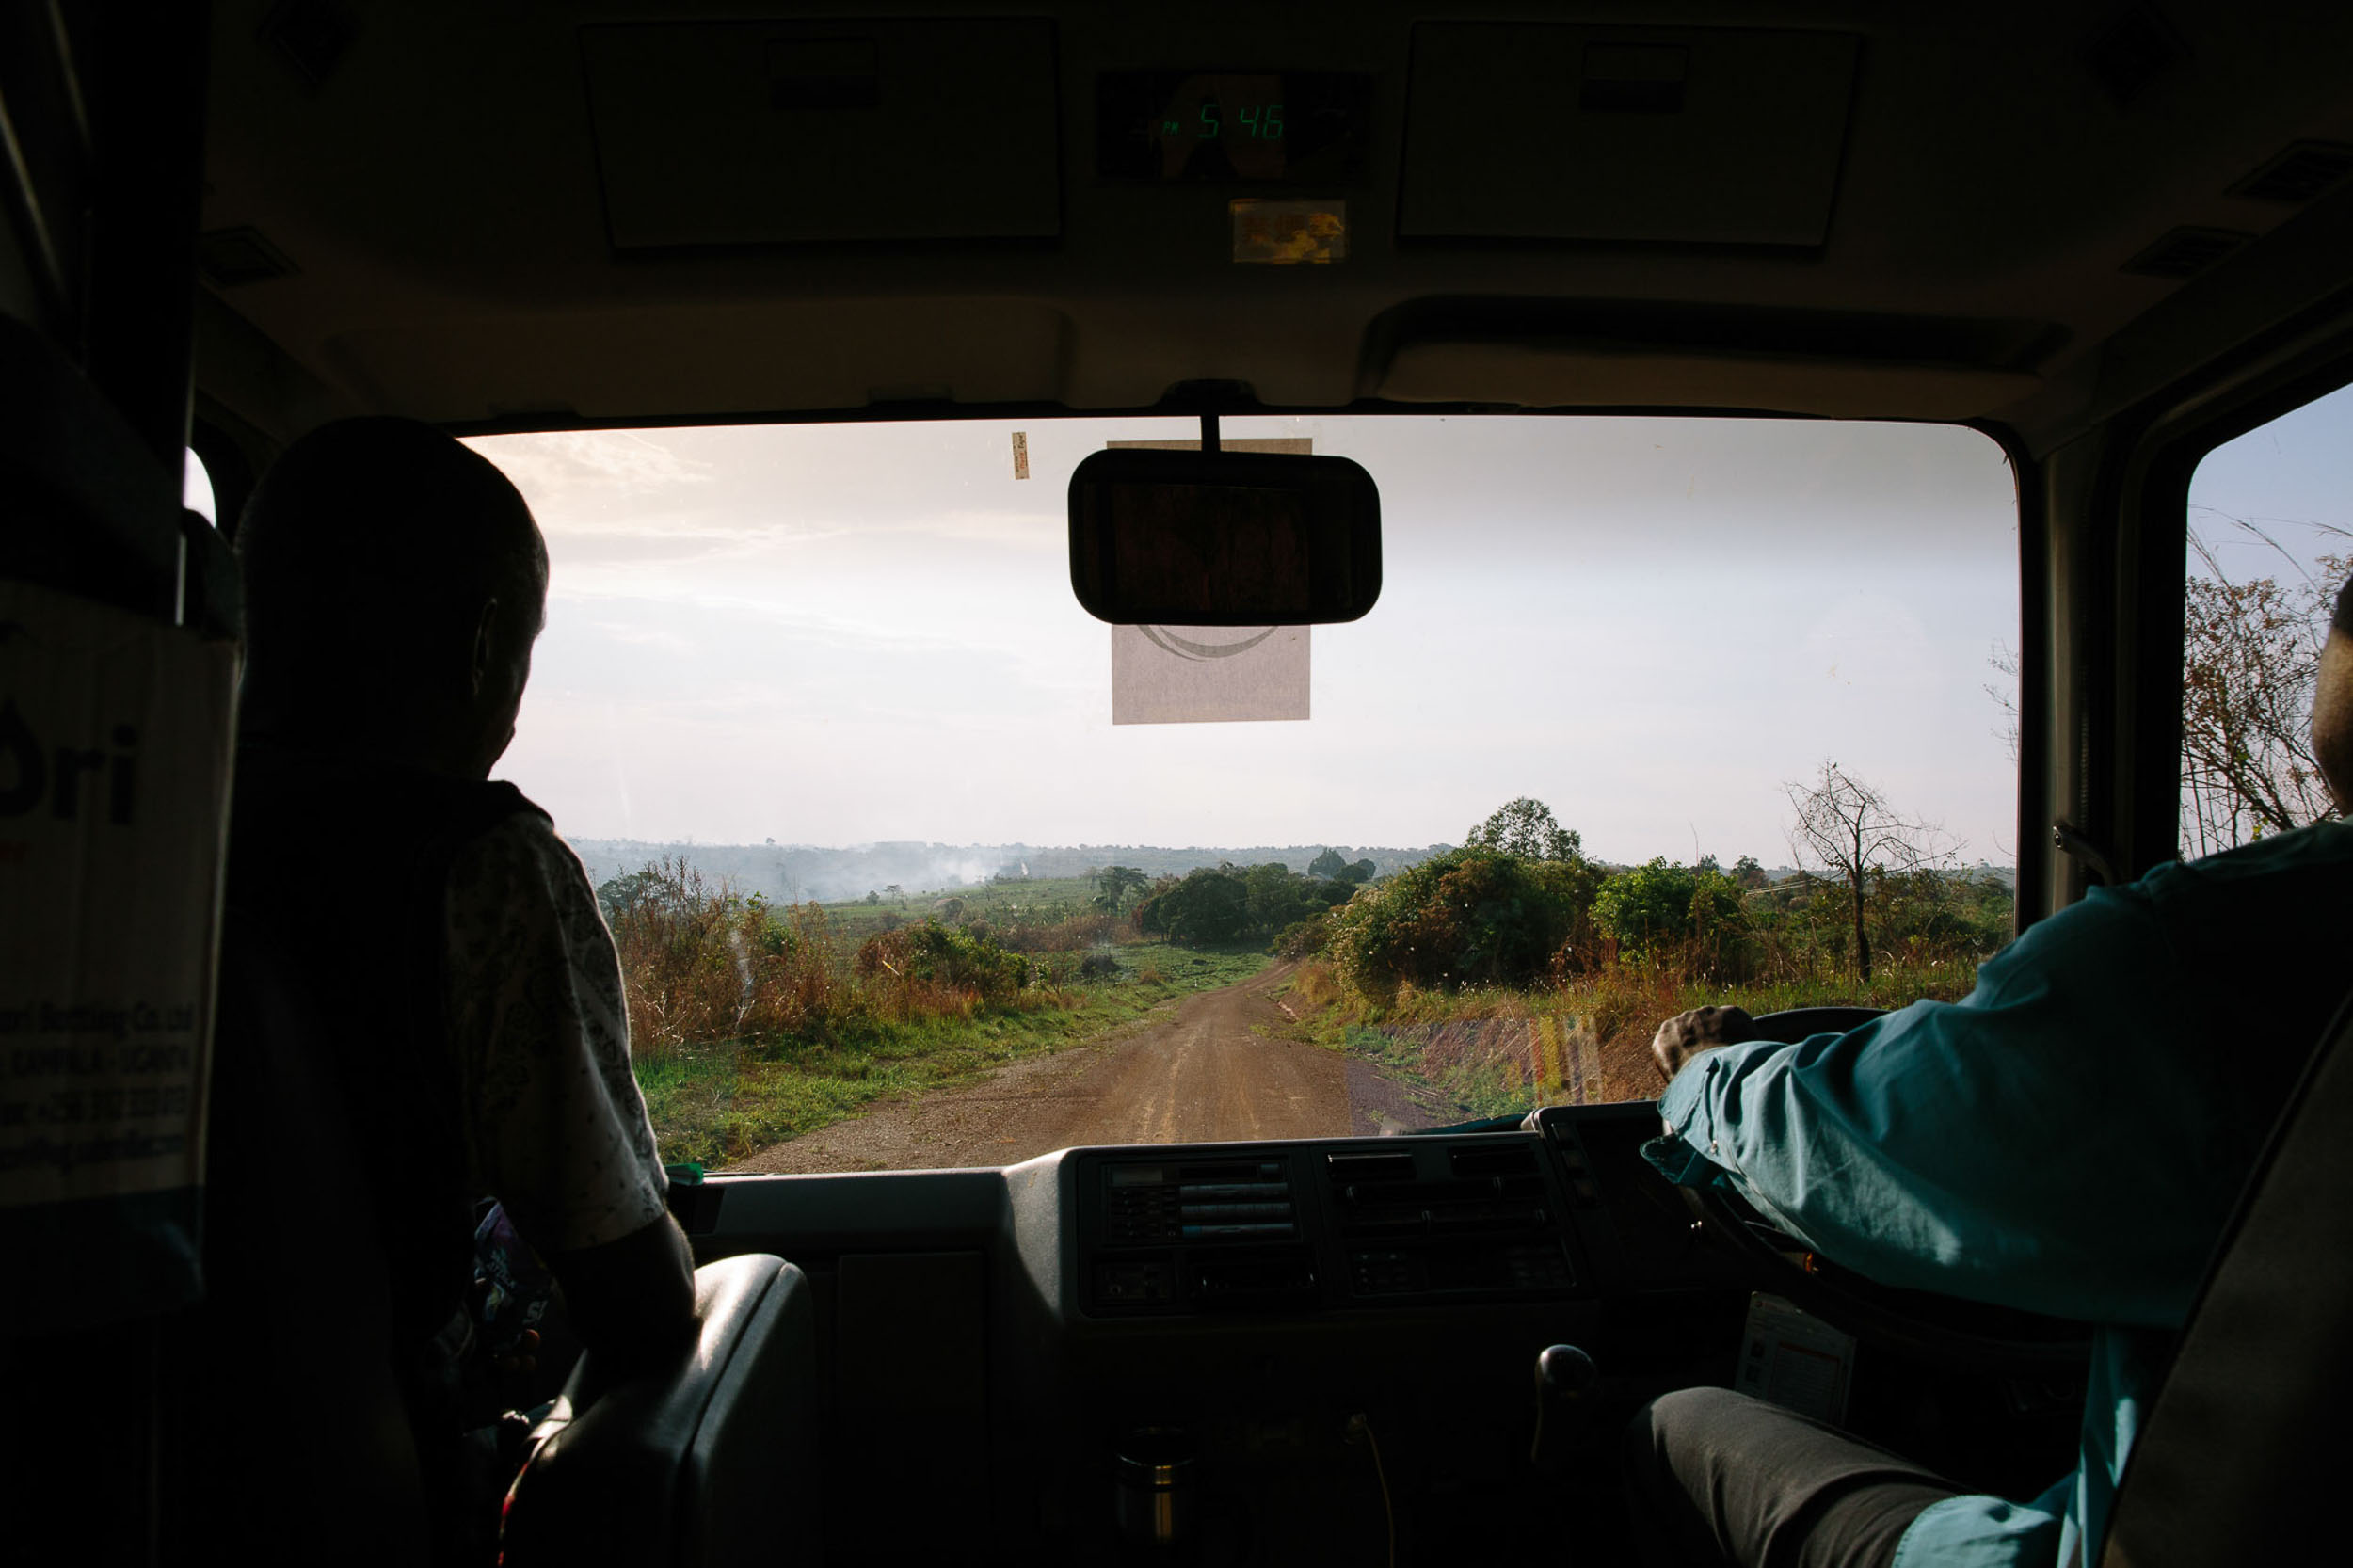 uganda-ajws-christine-han-photography-108.jpg